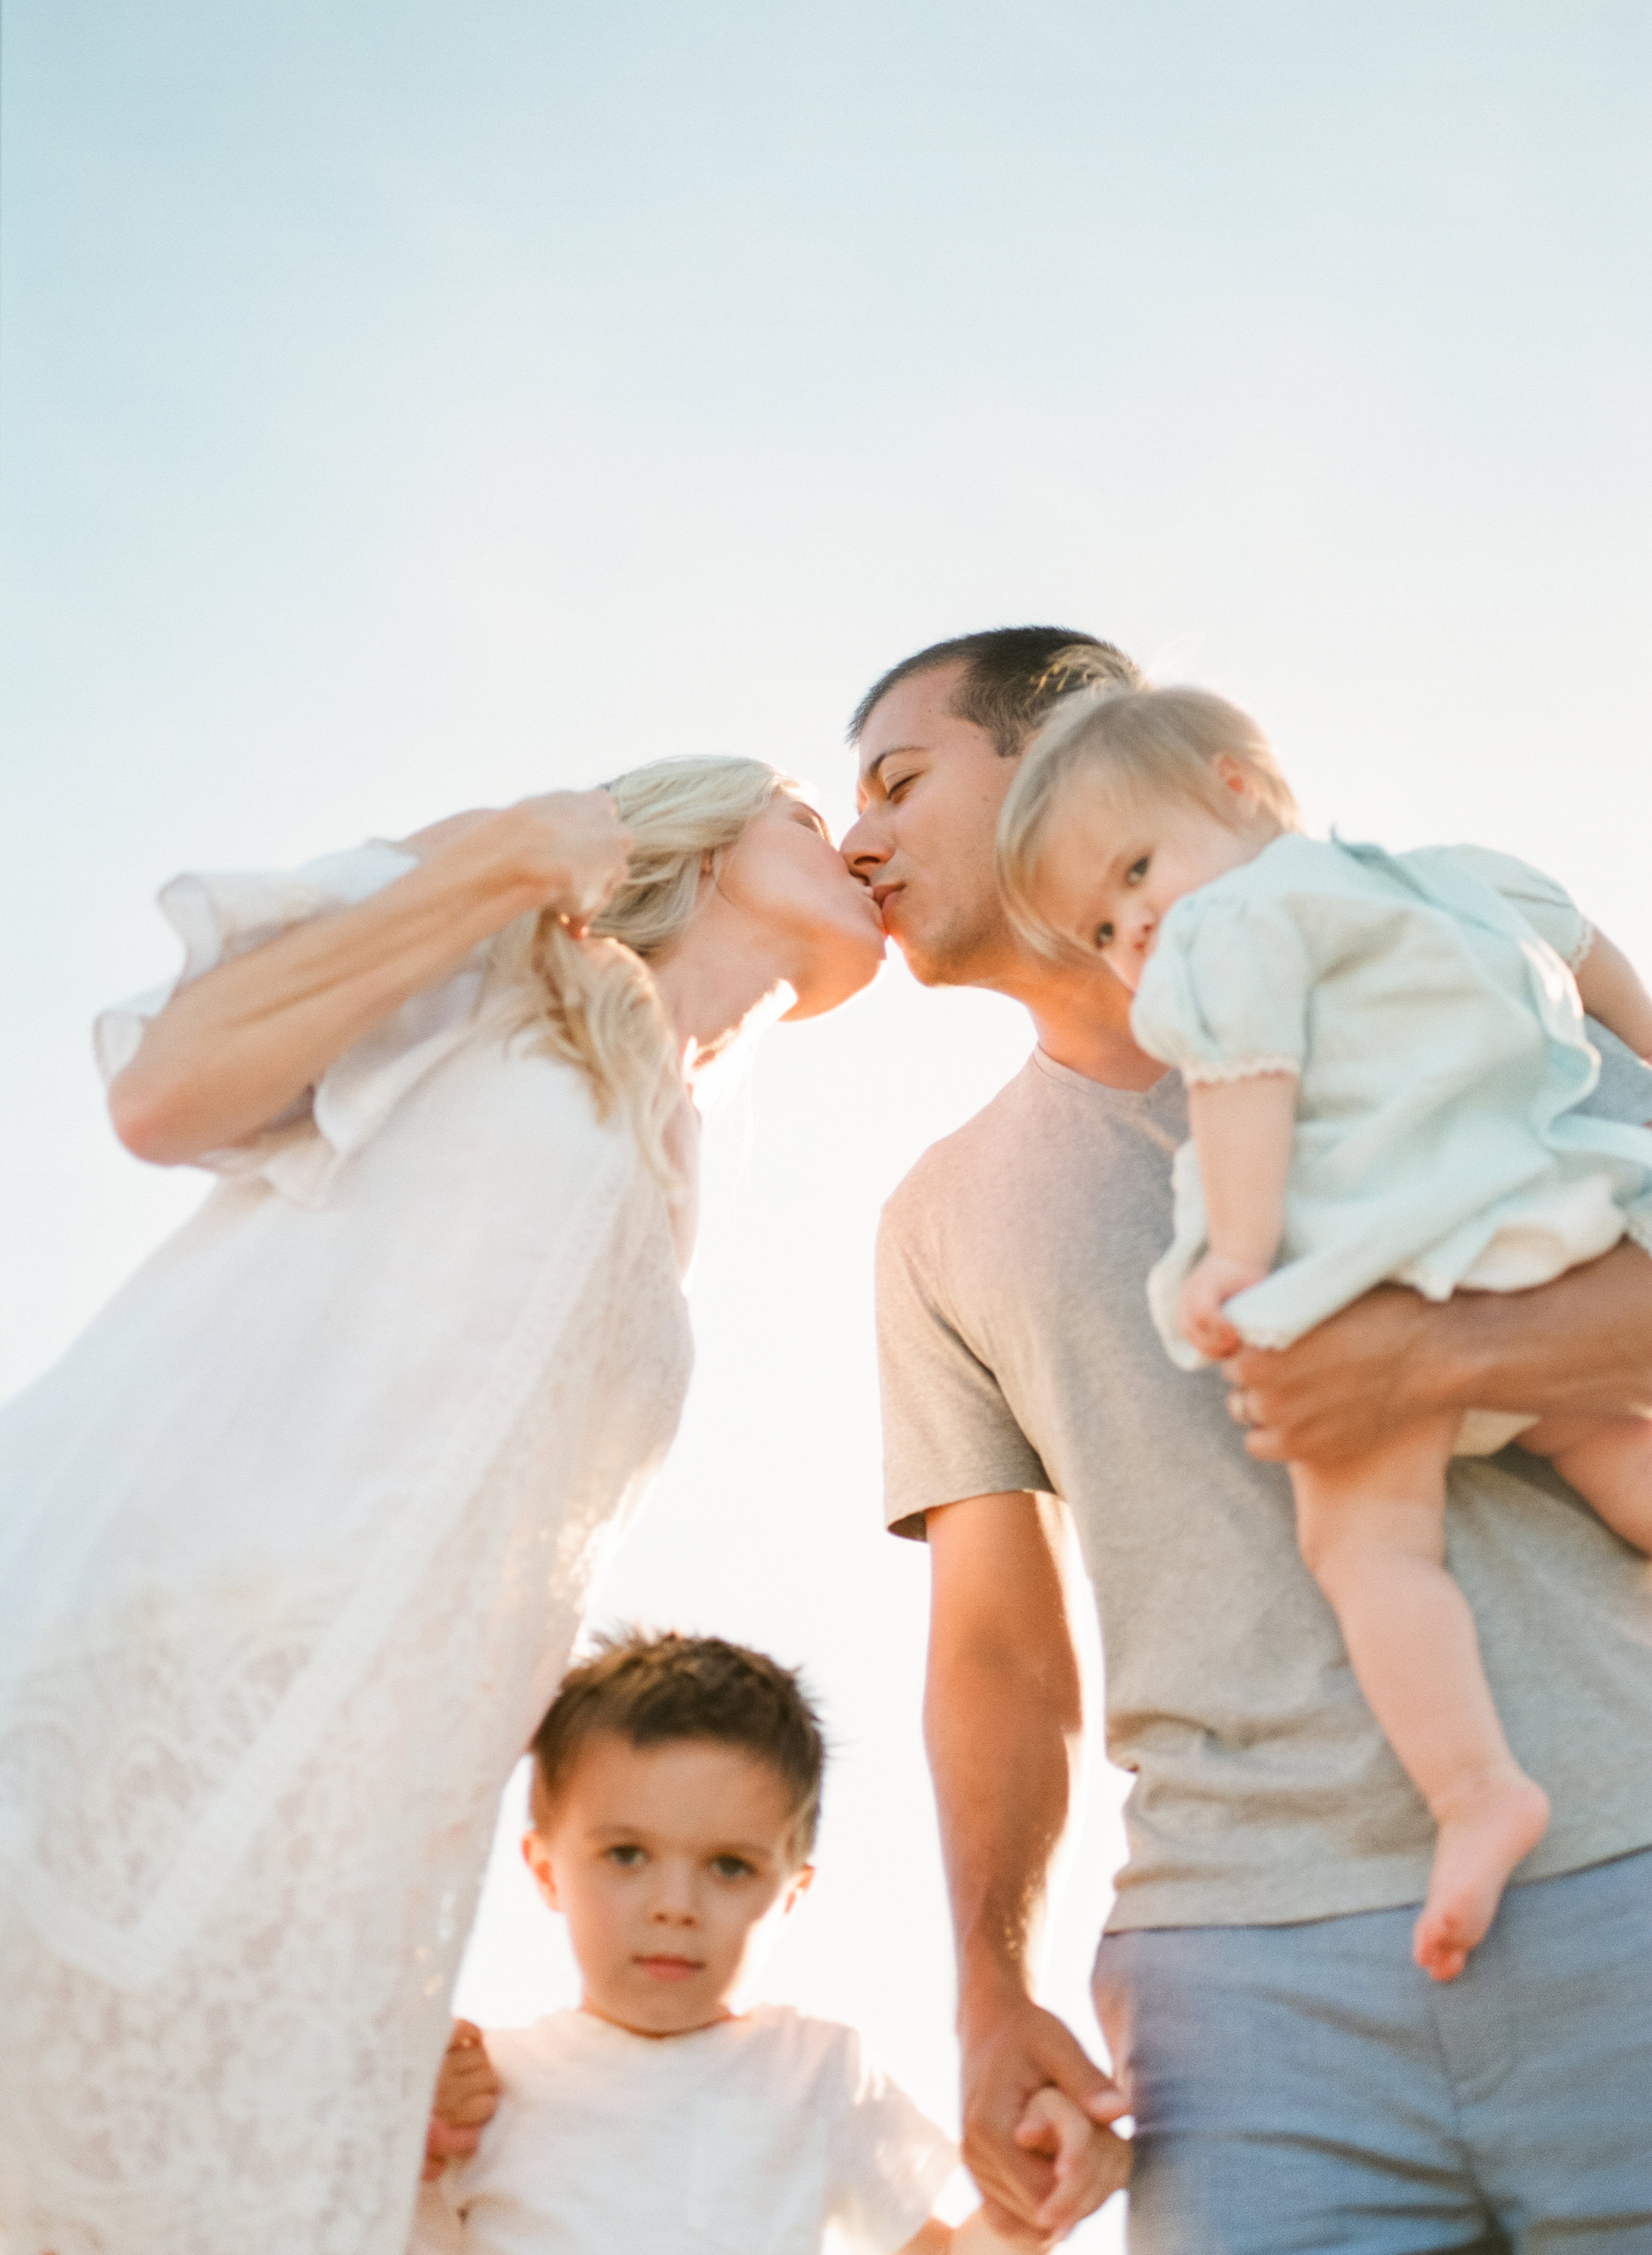 stephaniebryanphotography_mattiafamily-11.jpg